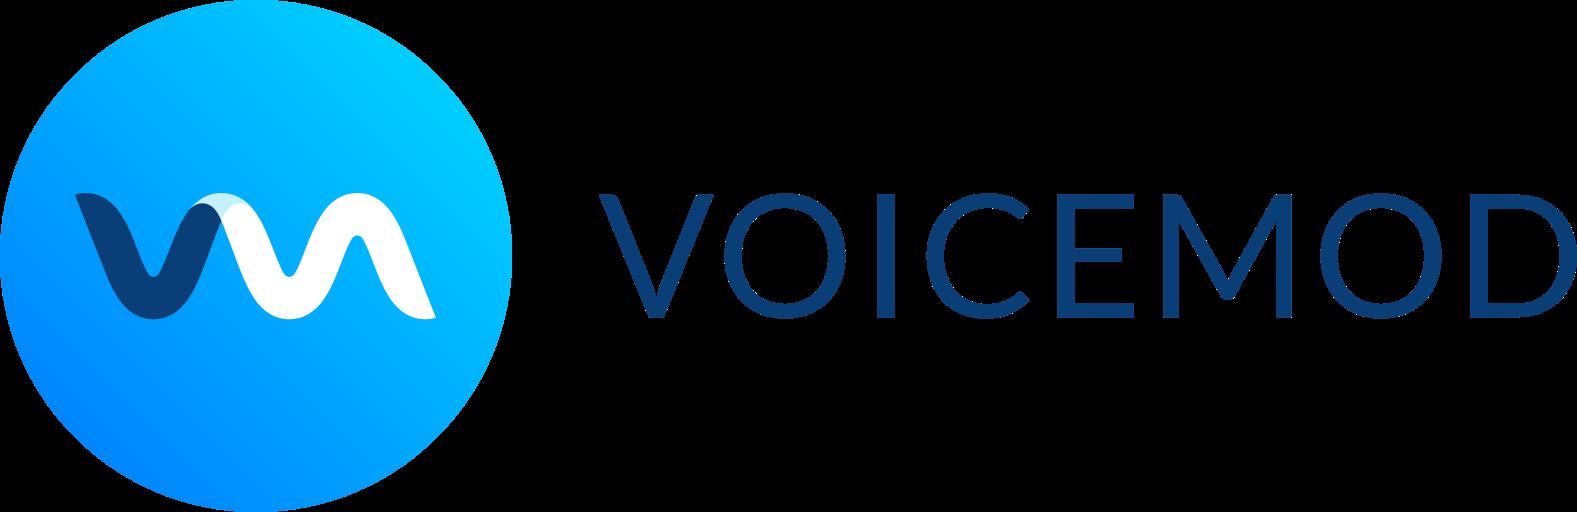 Voicemod Pro 2.1.3.2 Crack + License Key Latest Version 2021